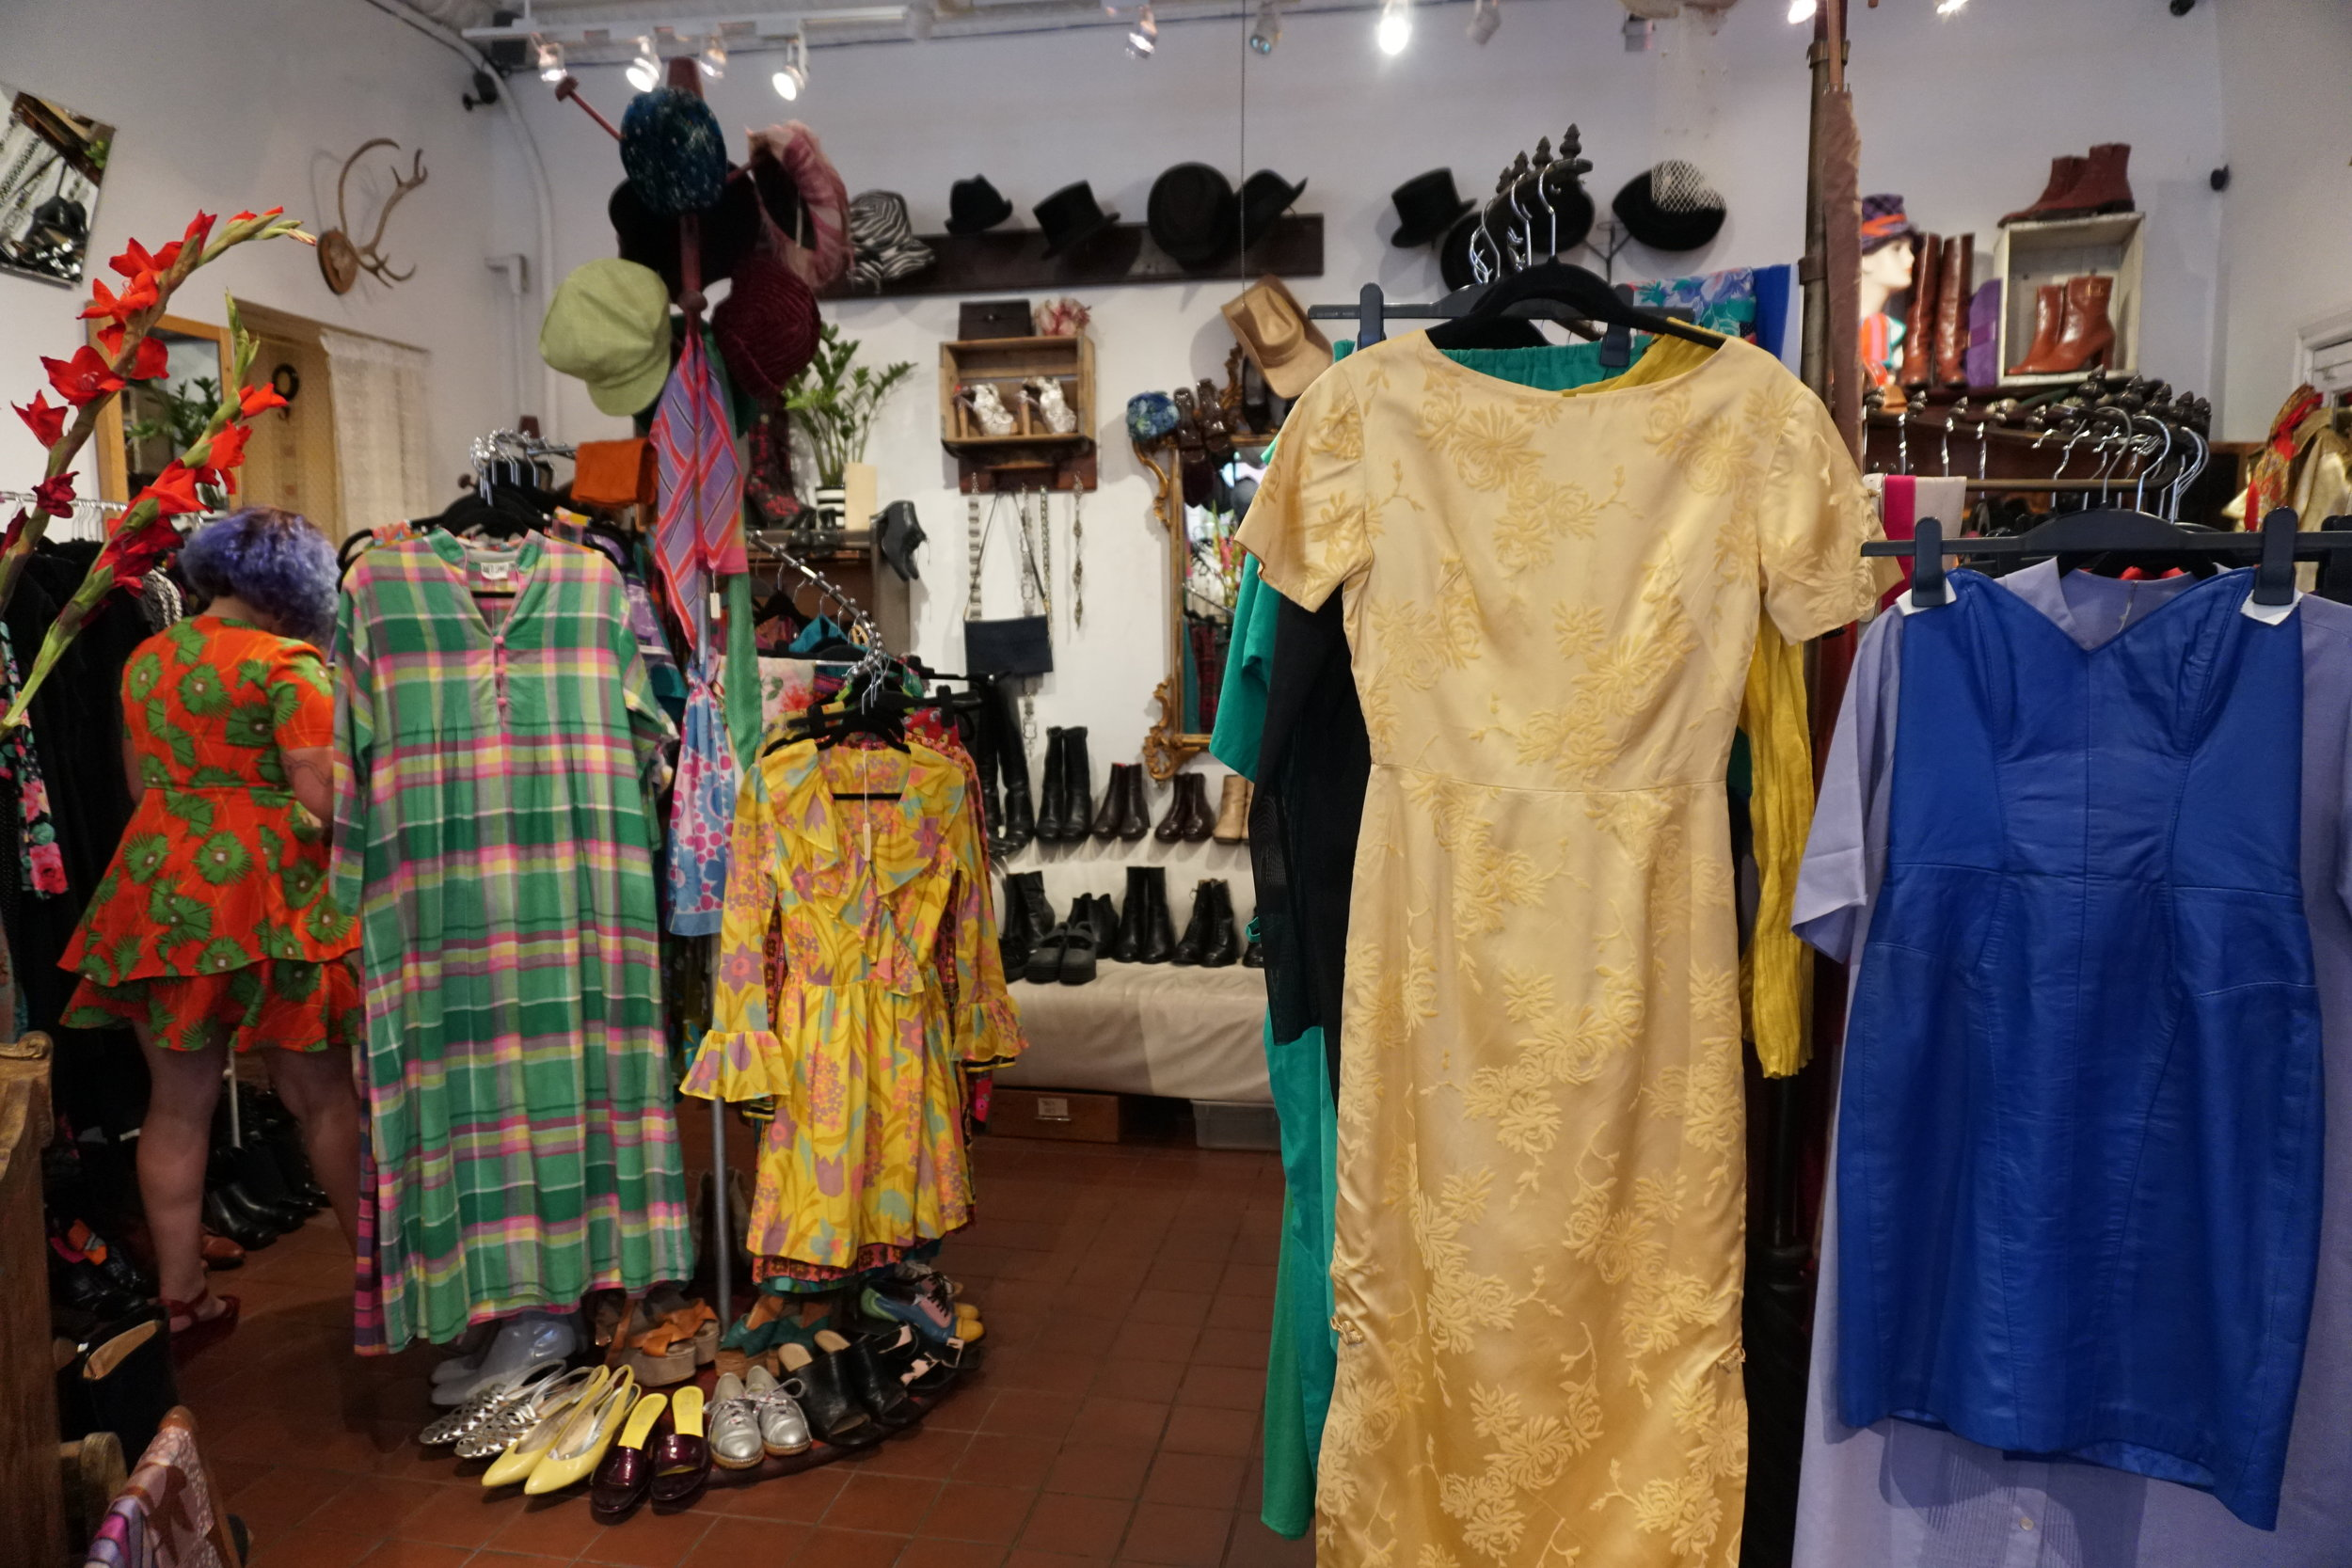 Malin+Landaeus+Best+Vintage+Clothing+Stores+in+Williamsburg+